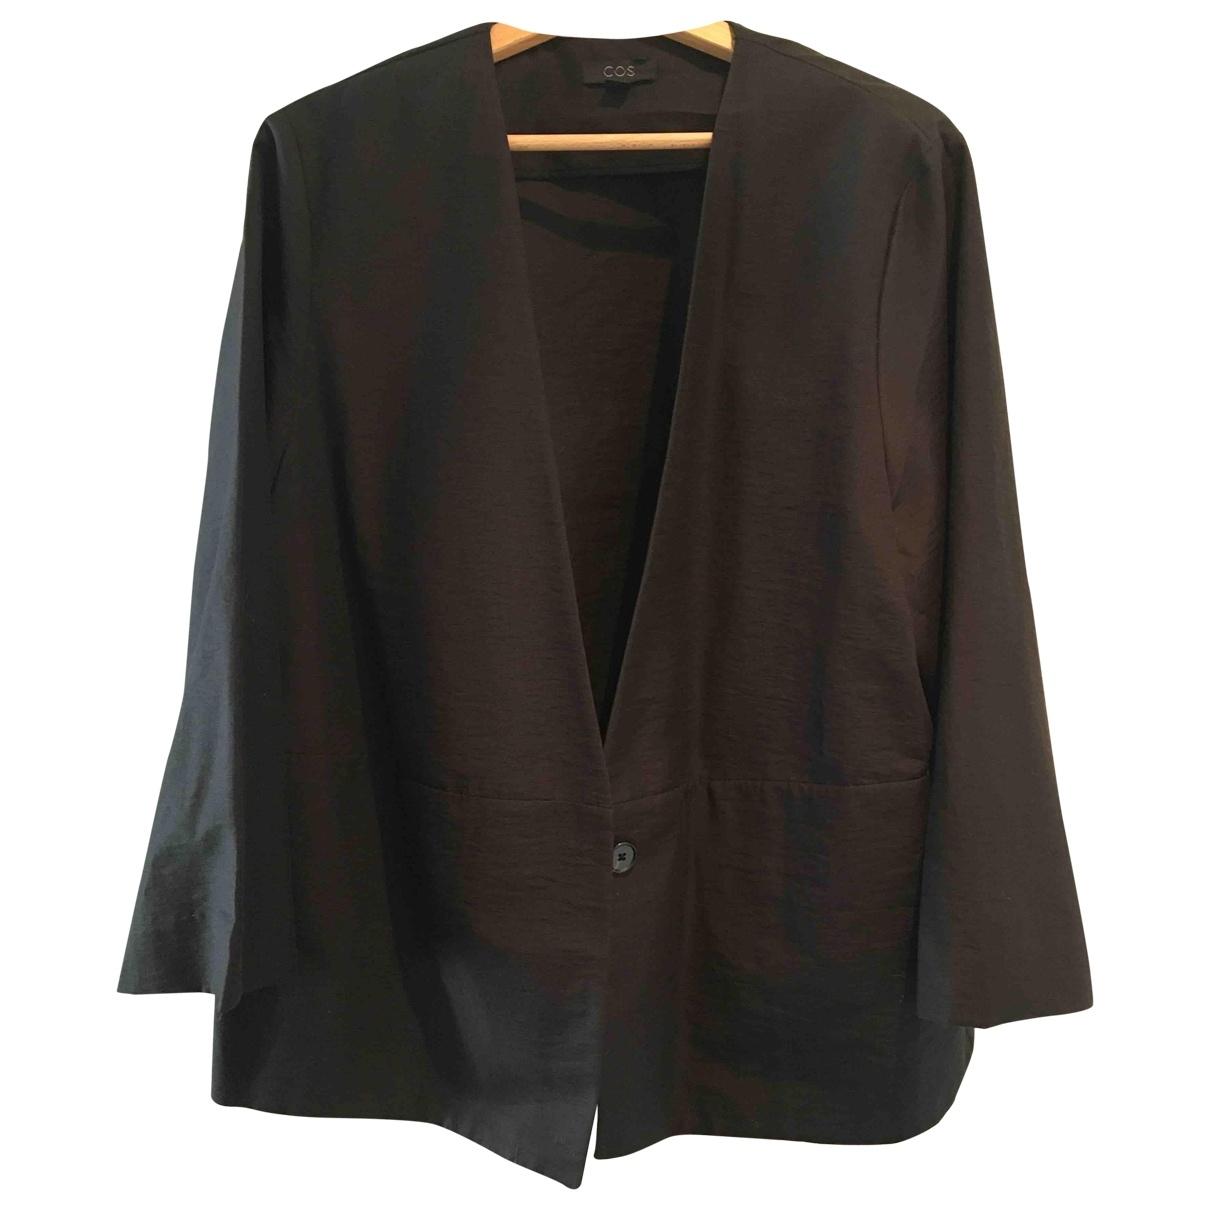 Cos \N Black Cotton jacket for Women 38 FR